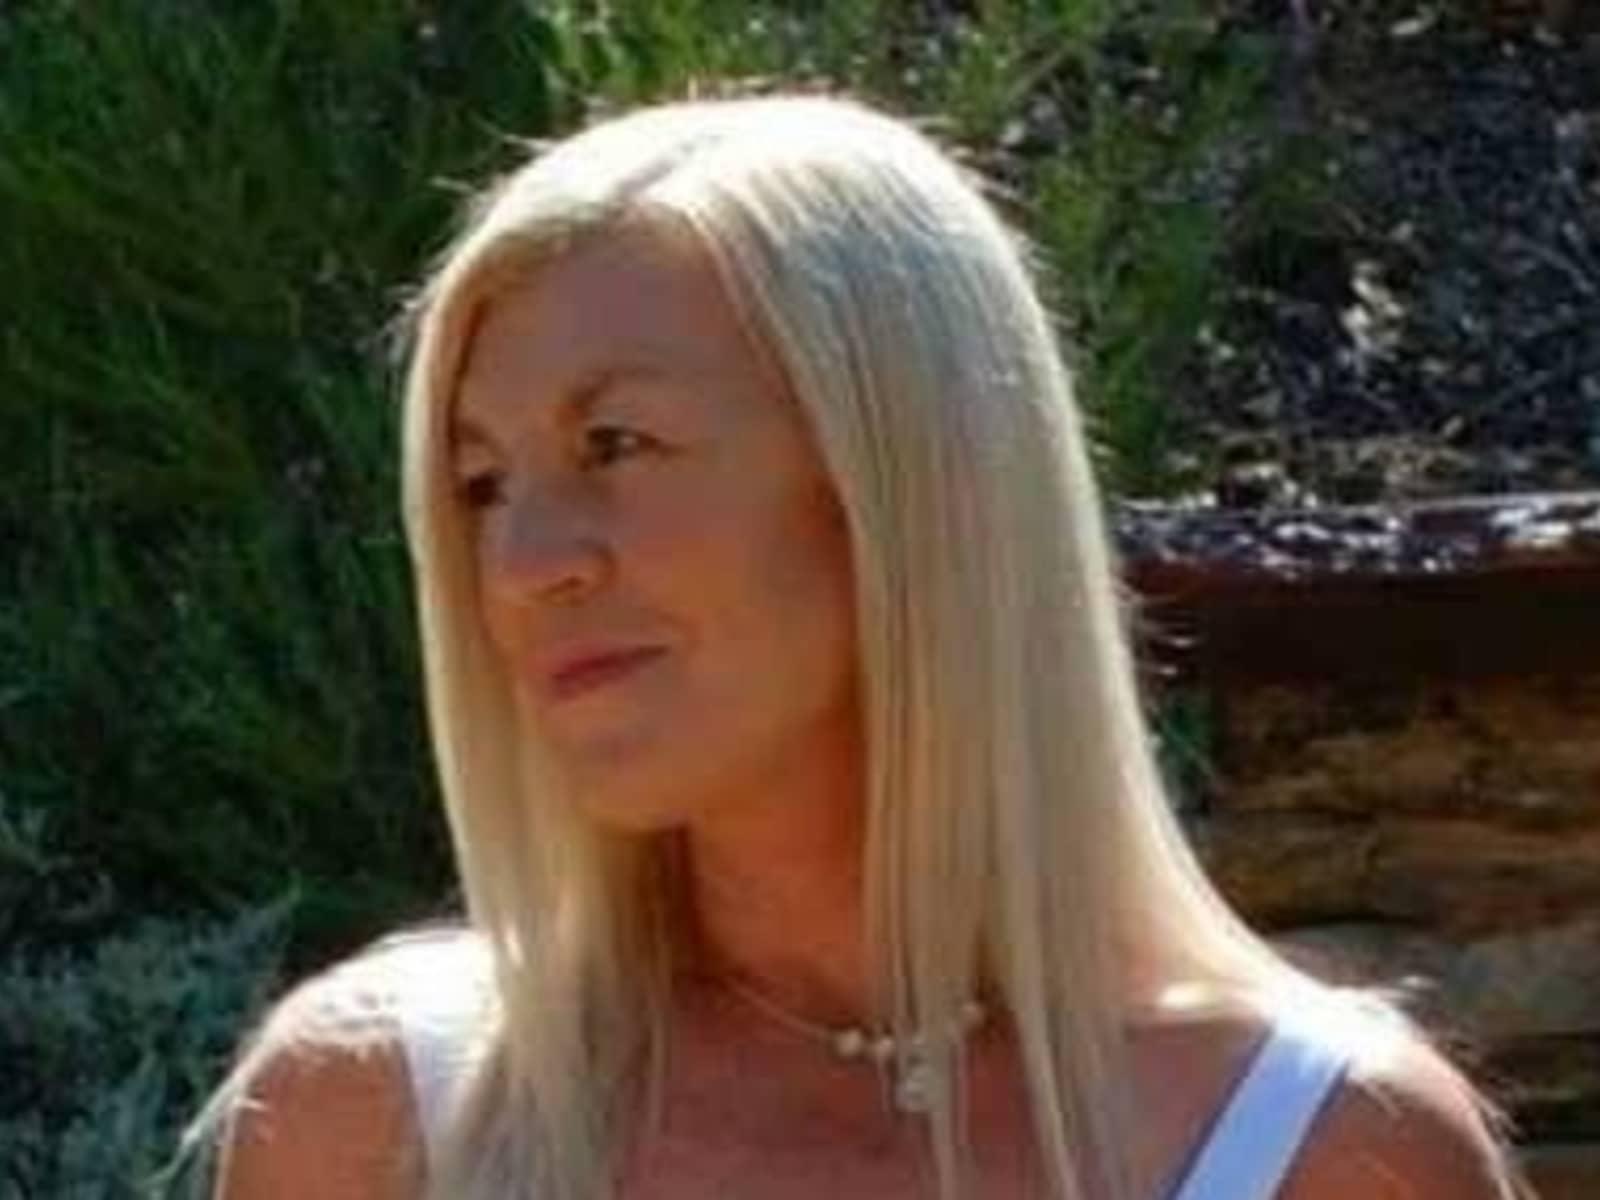 Kim from Sunshine Coast, Queensland, Australia